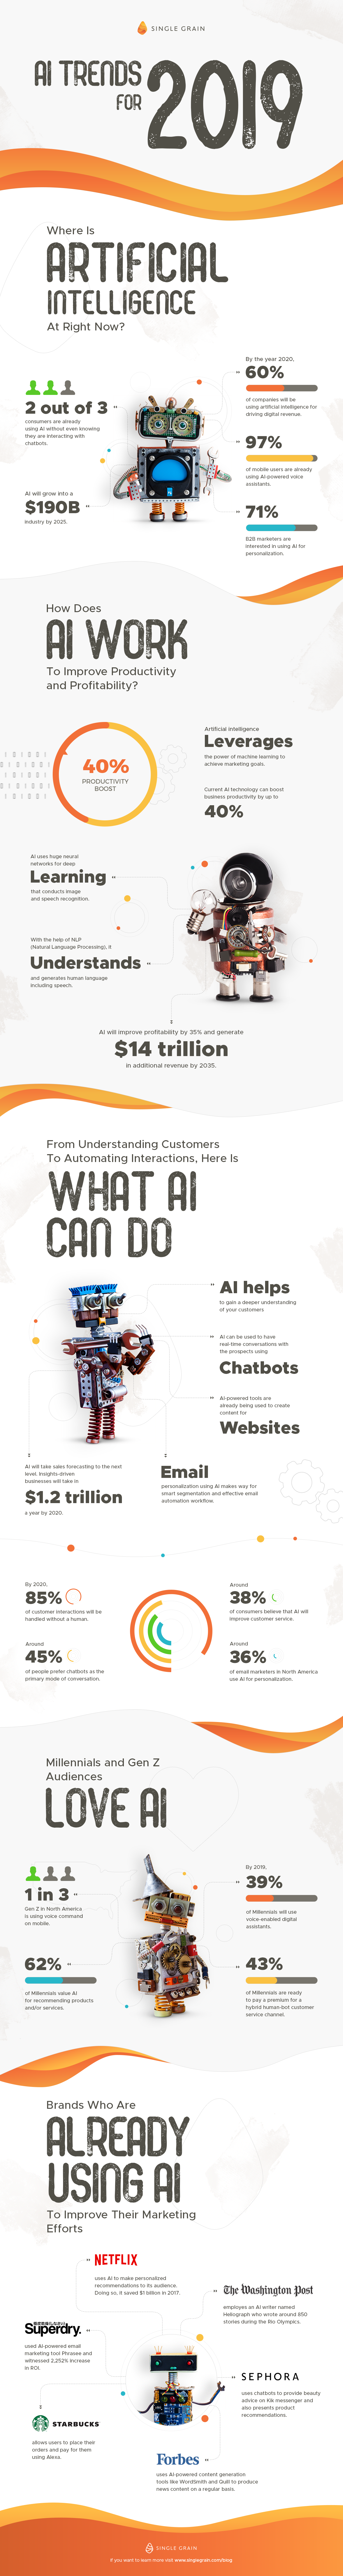 Tendencias de IA en marketing para 2019 [Infographic]